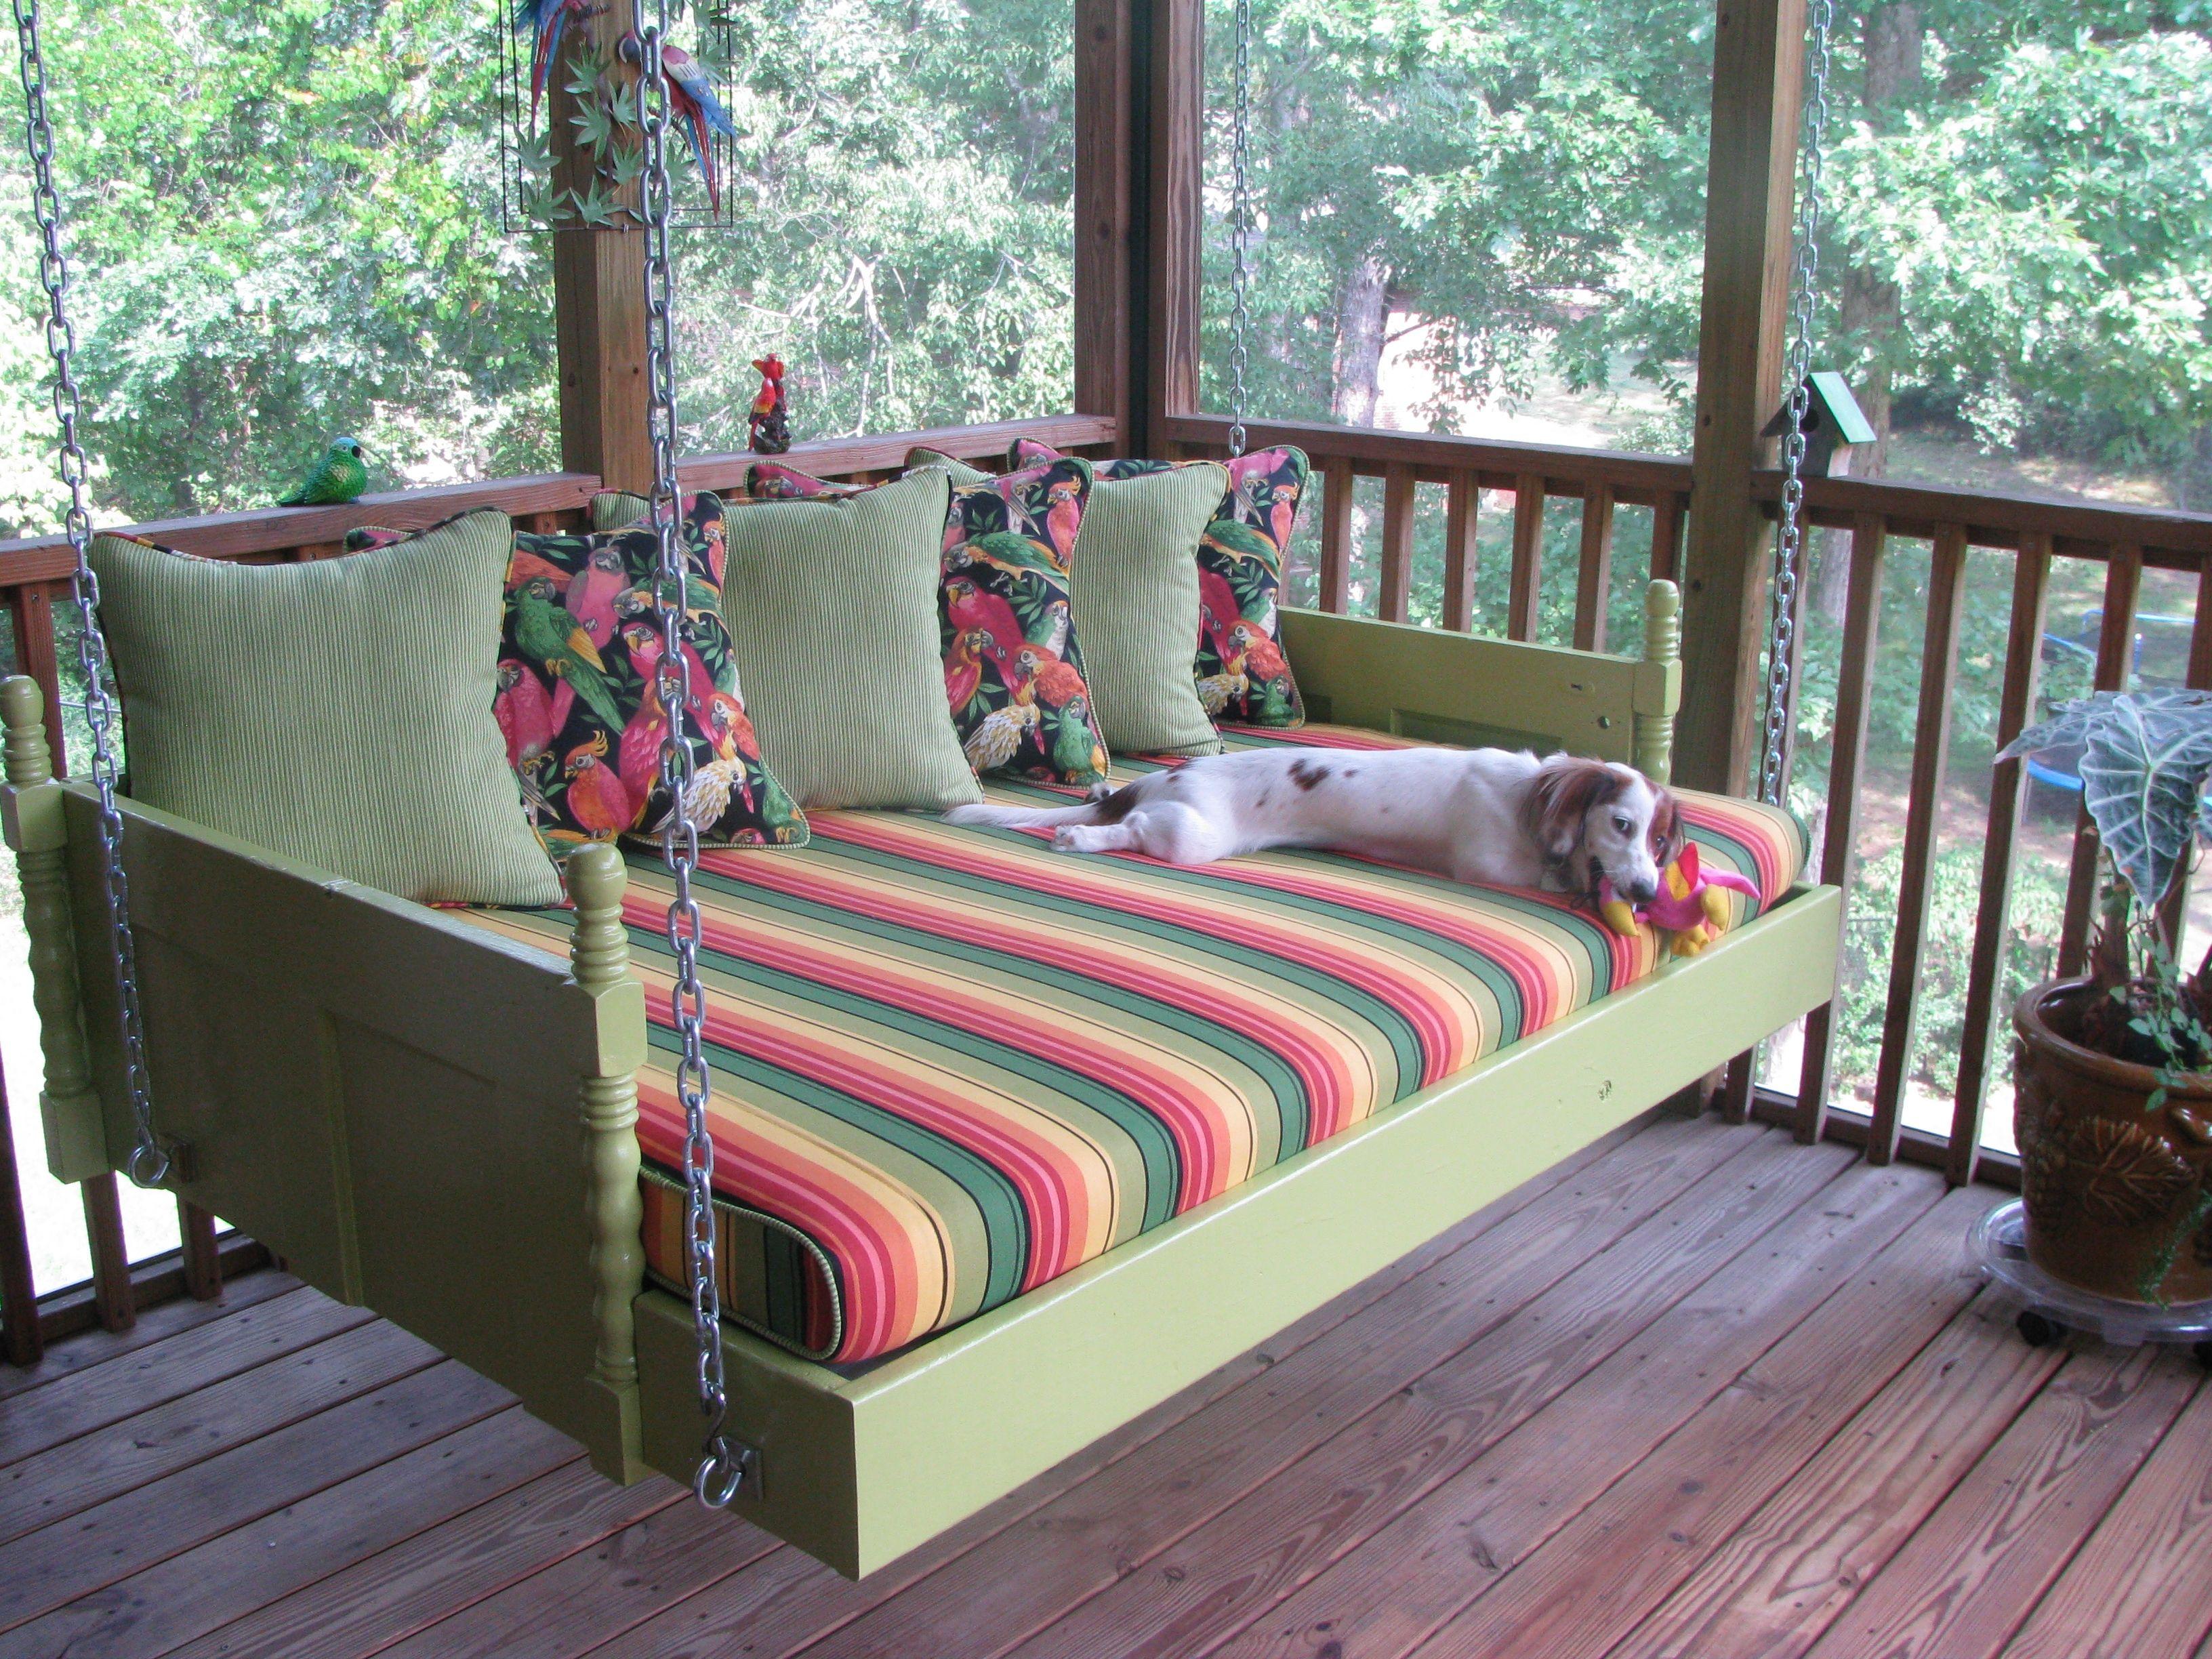 sofa porch swings |  > swings : 832: home furnishings>furniture